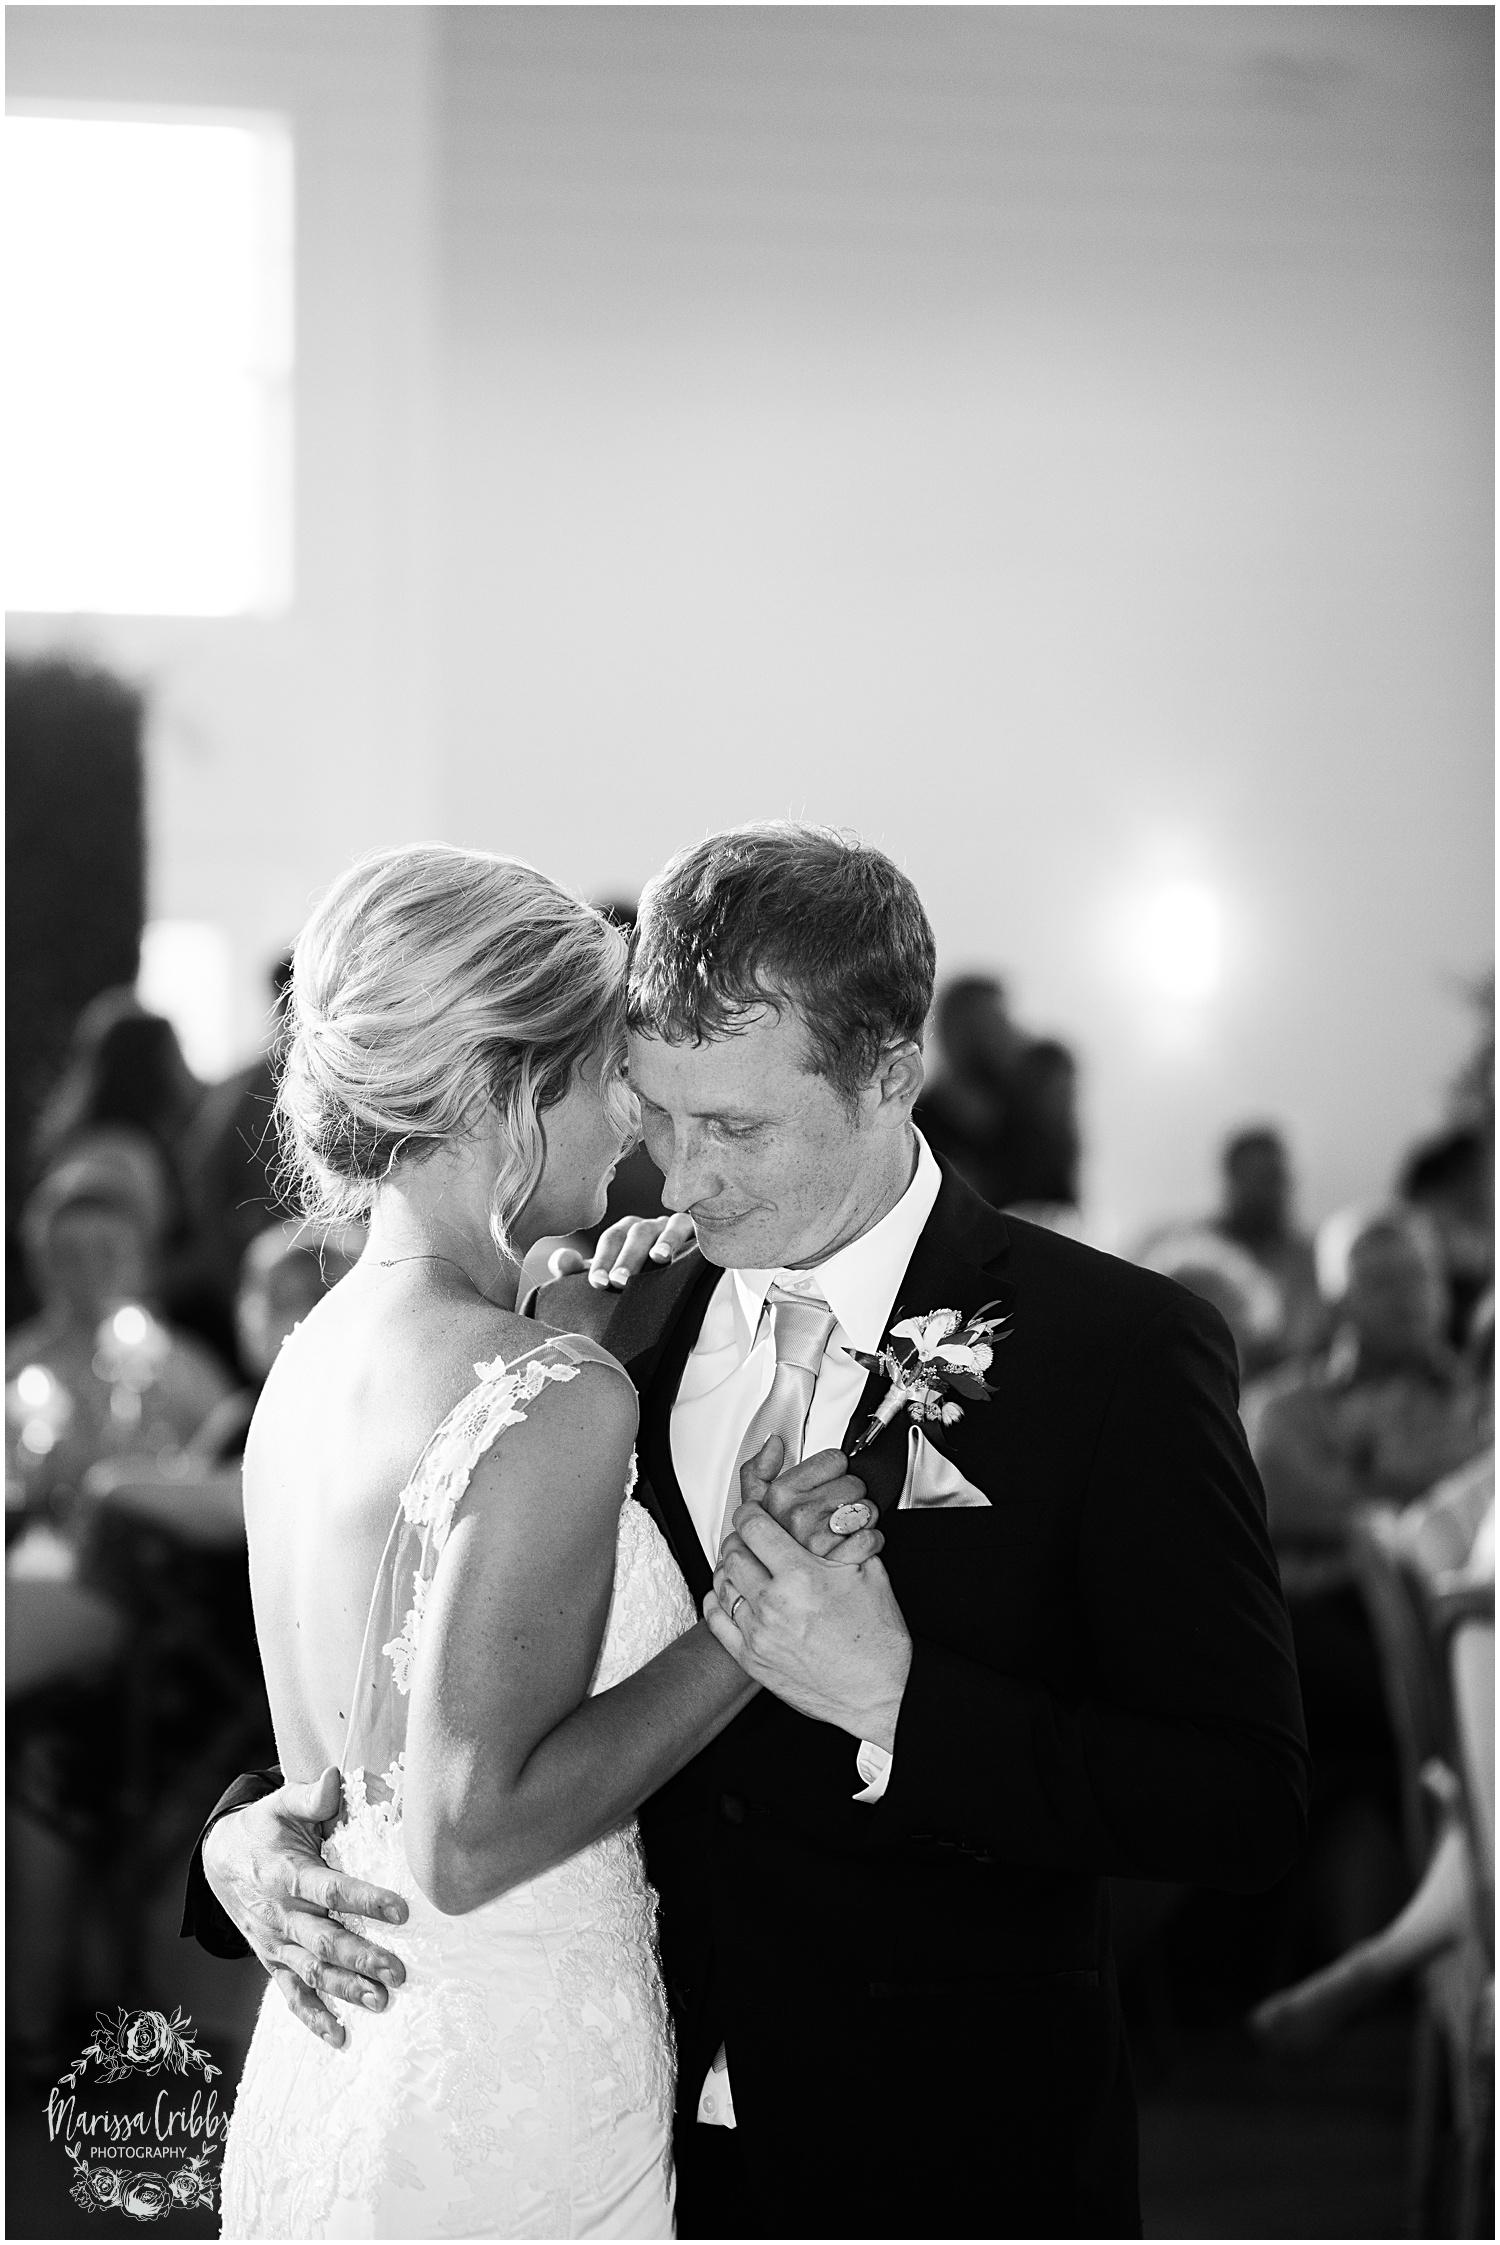 CHELSEA & BEN MARRIED BLOG  | MARISSA CRIBBS PHOTOGRAPHY_8614.jpg